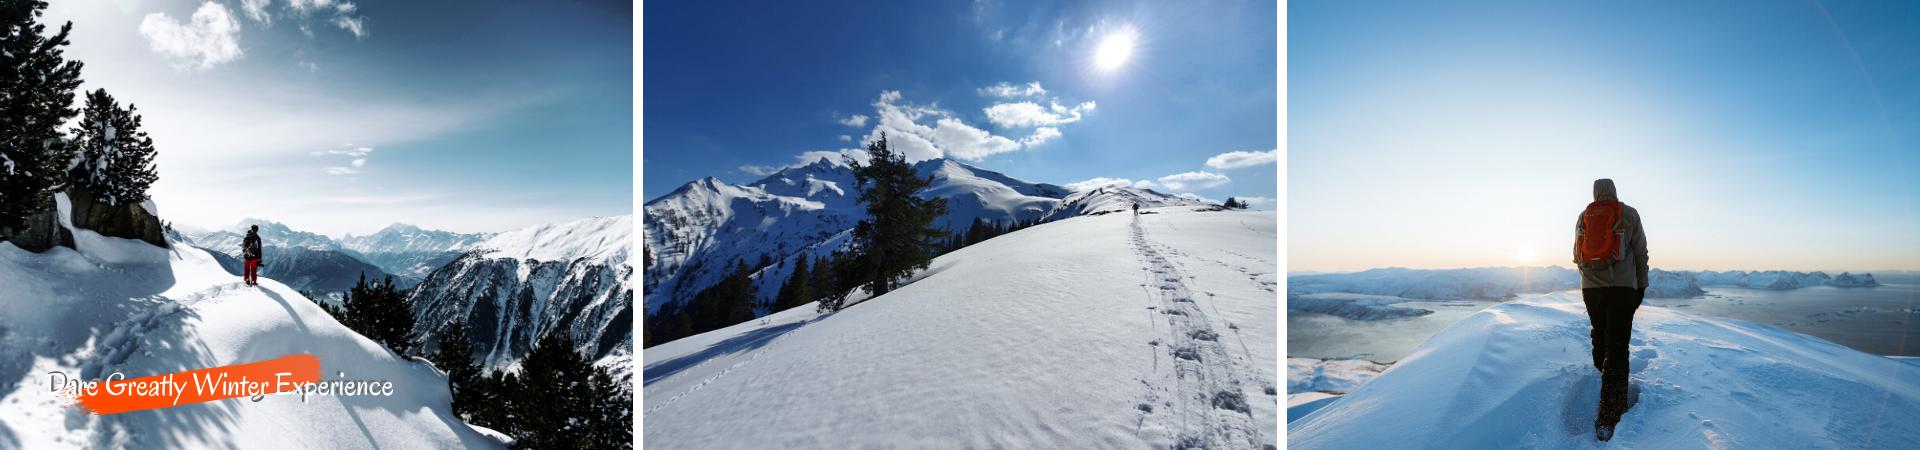 202005145v01-DGC-Winter-Experience-2020-01